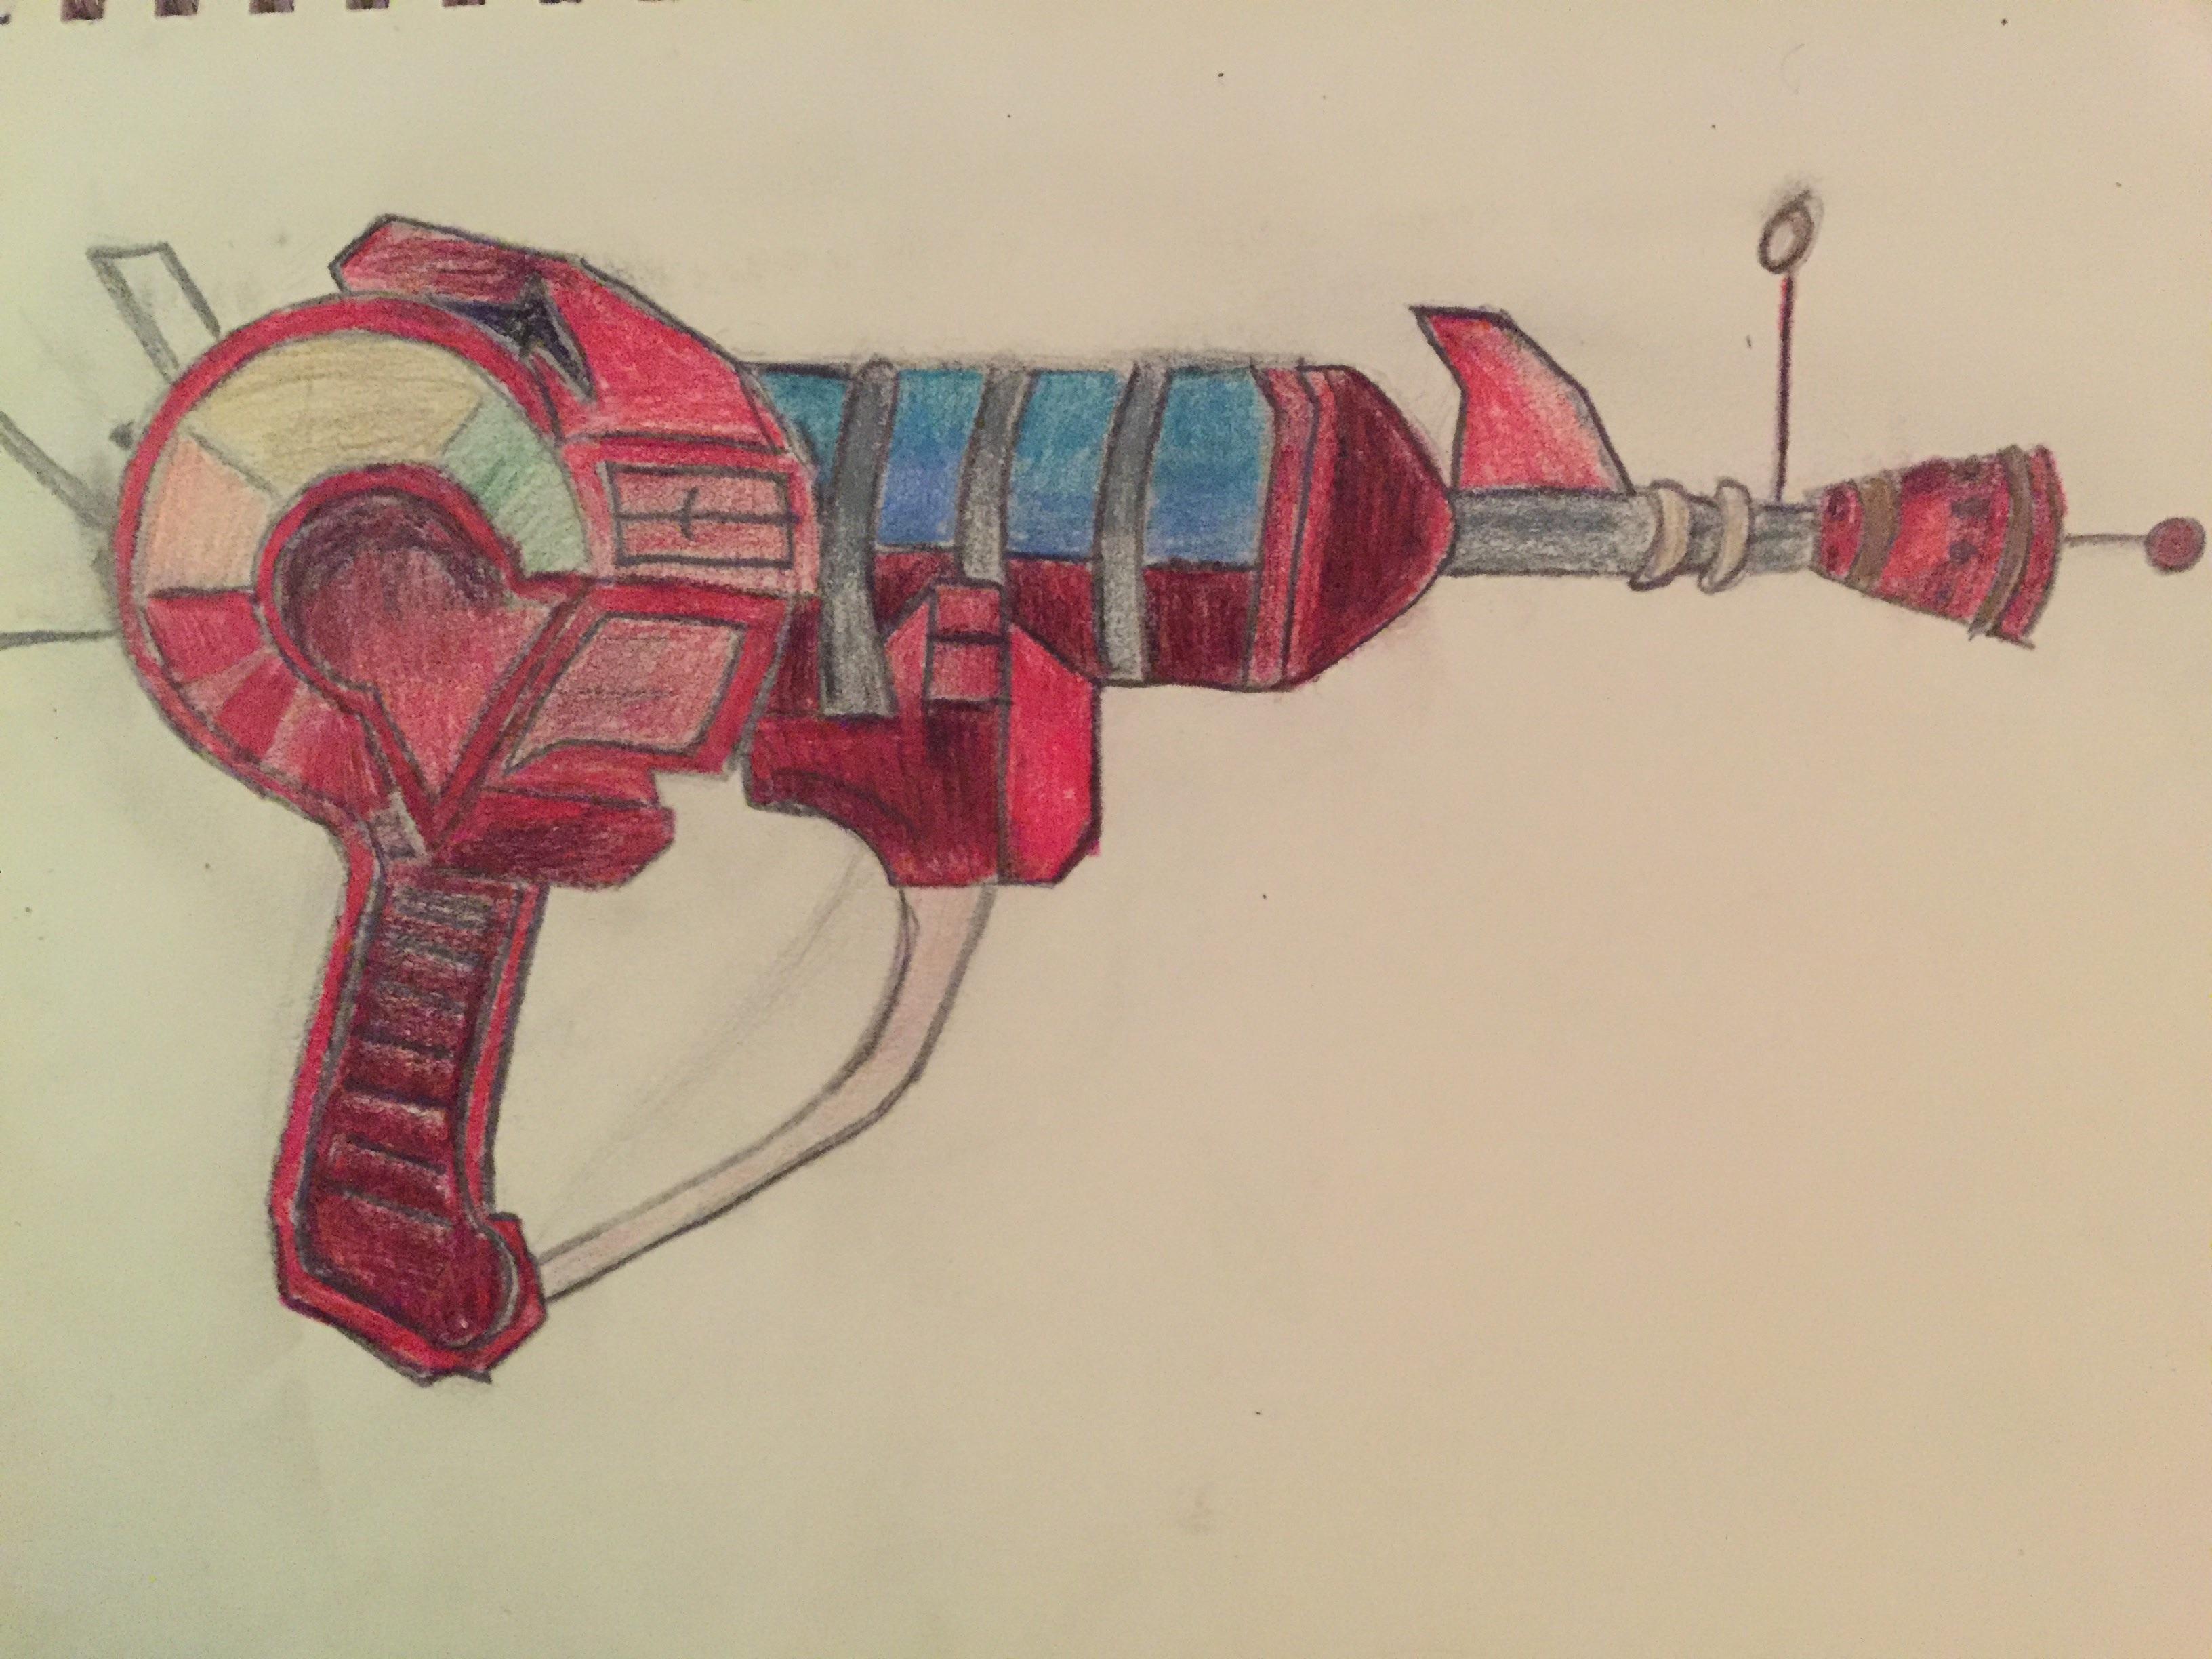 3264x2448 Raygun Drawing I Did Last Year Codzombies